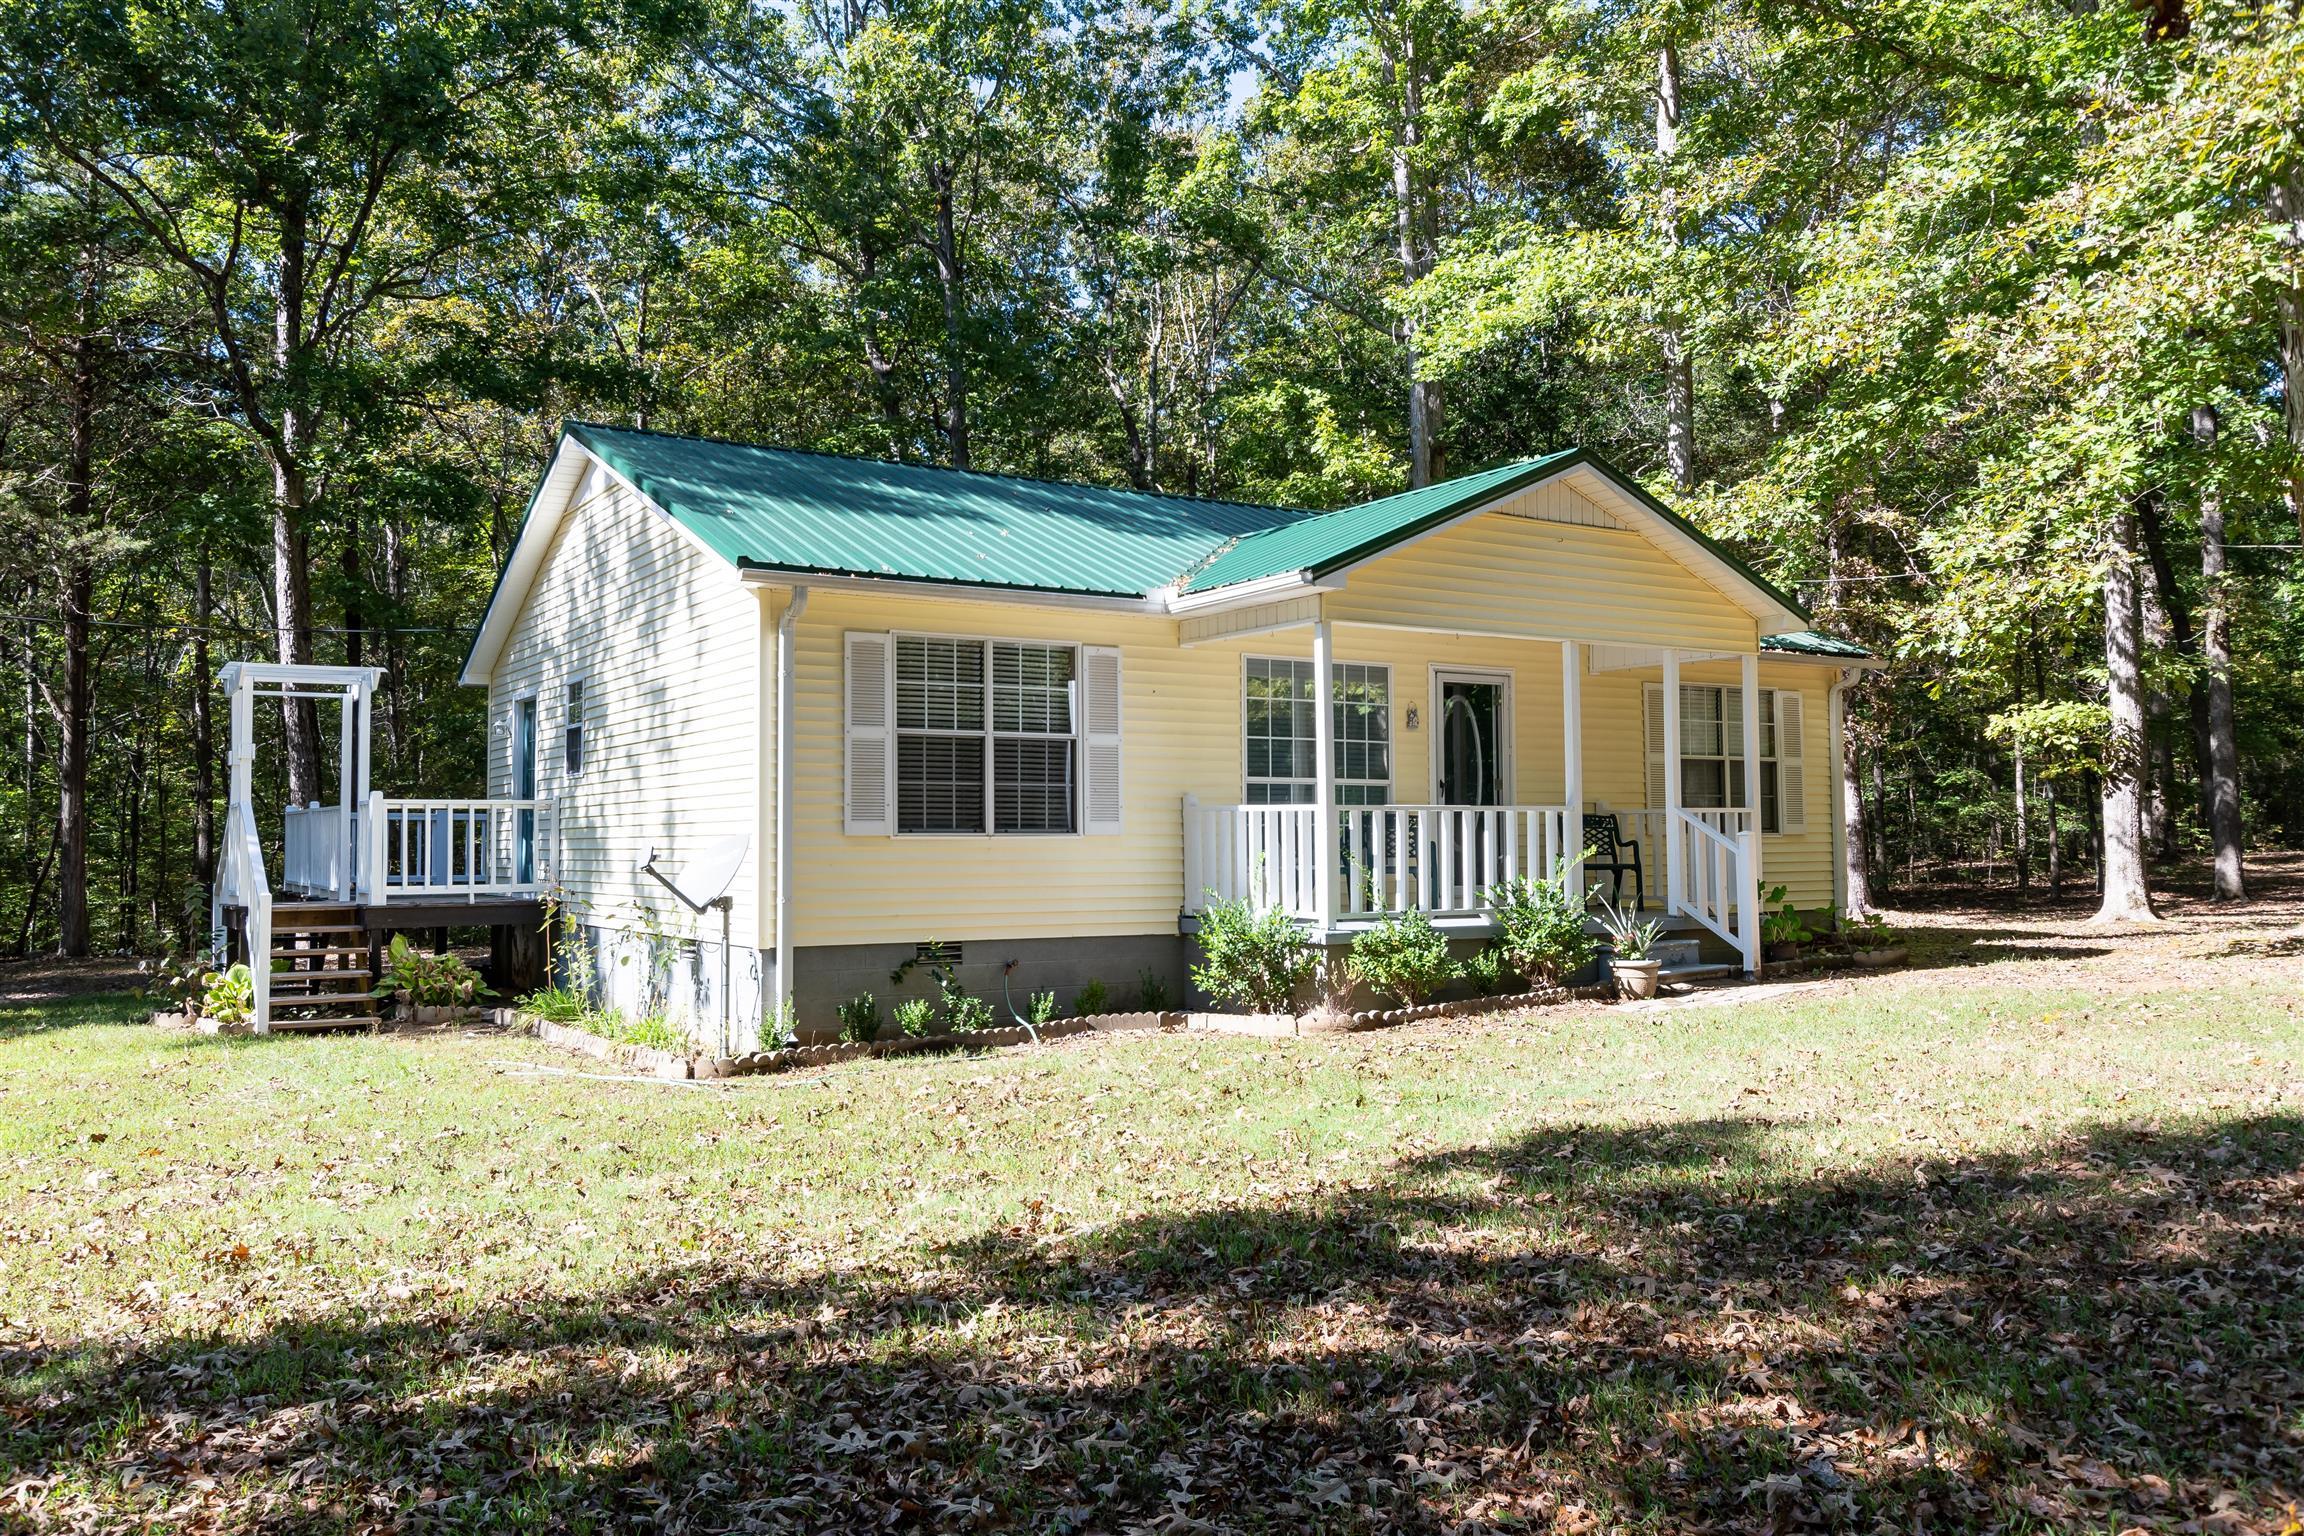 3490 Dunbar Rd, Decaturville, TN 38329 - Decaturville, TN real estate listing